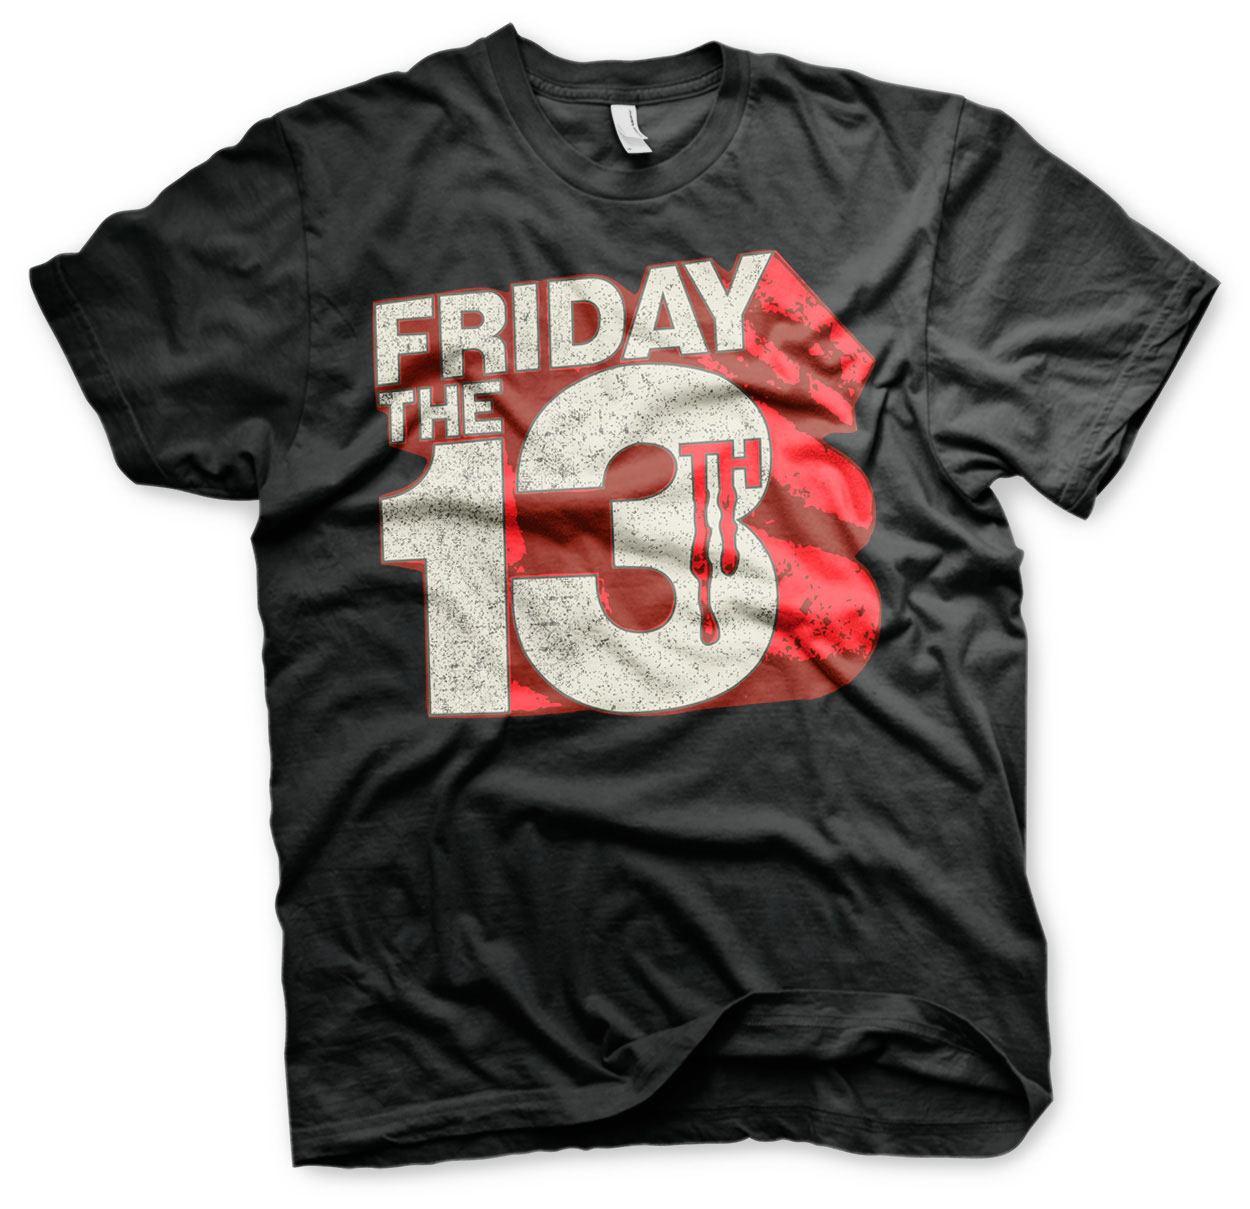 Friday the 13th T-Shirt Block Logo Size L